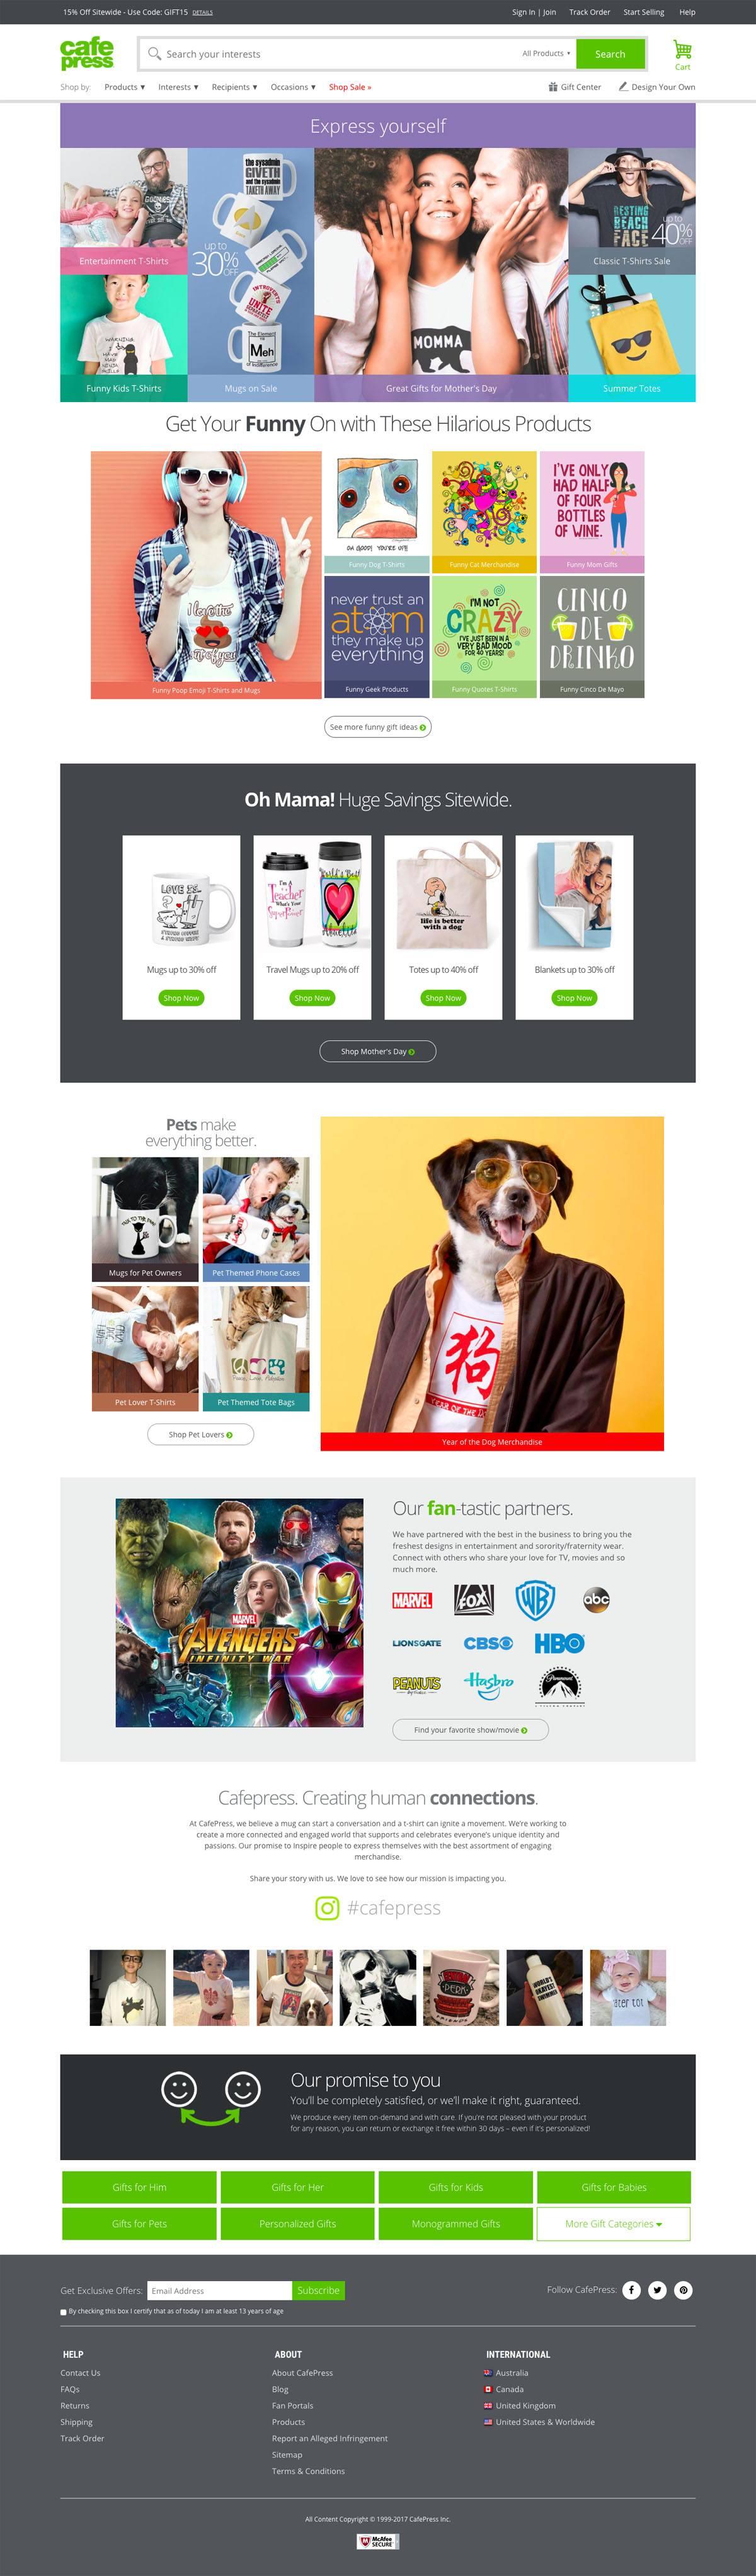 eCommerce website: CafePress